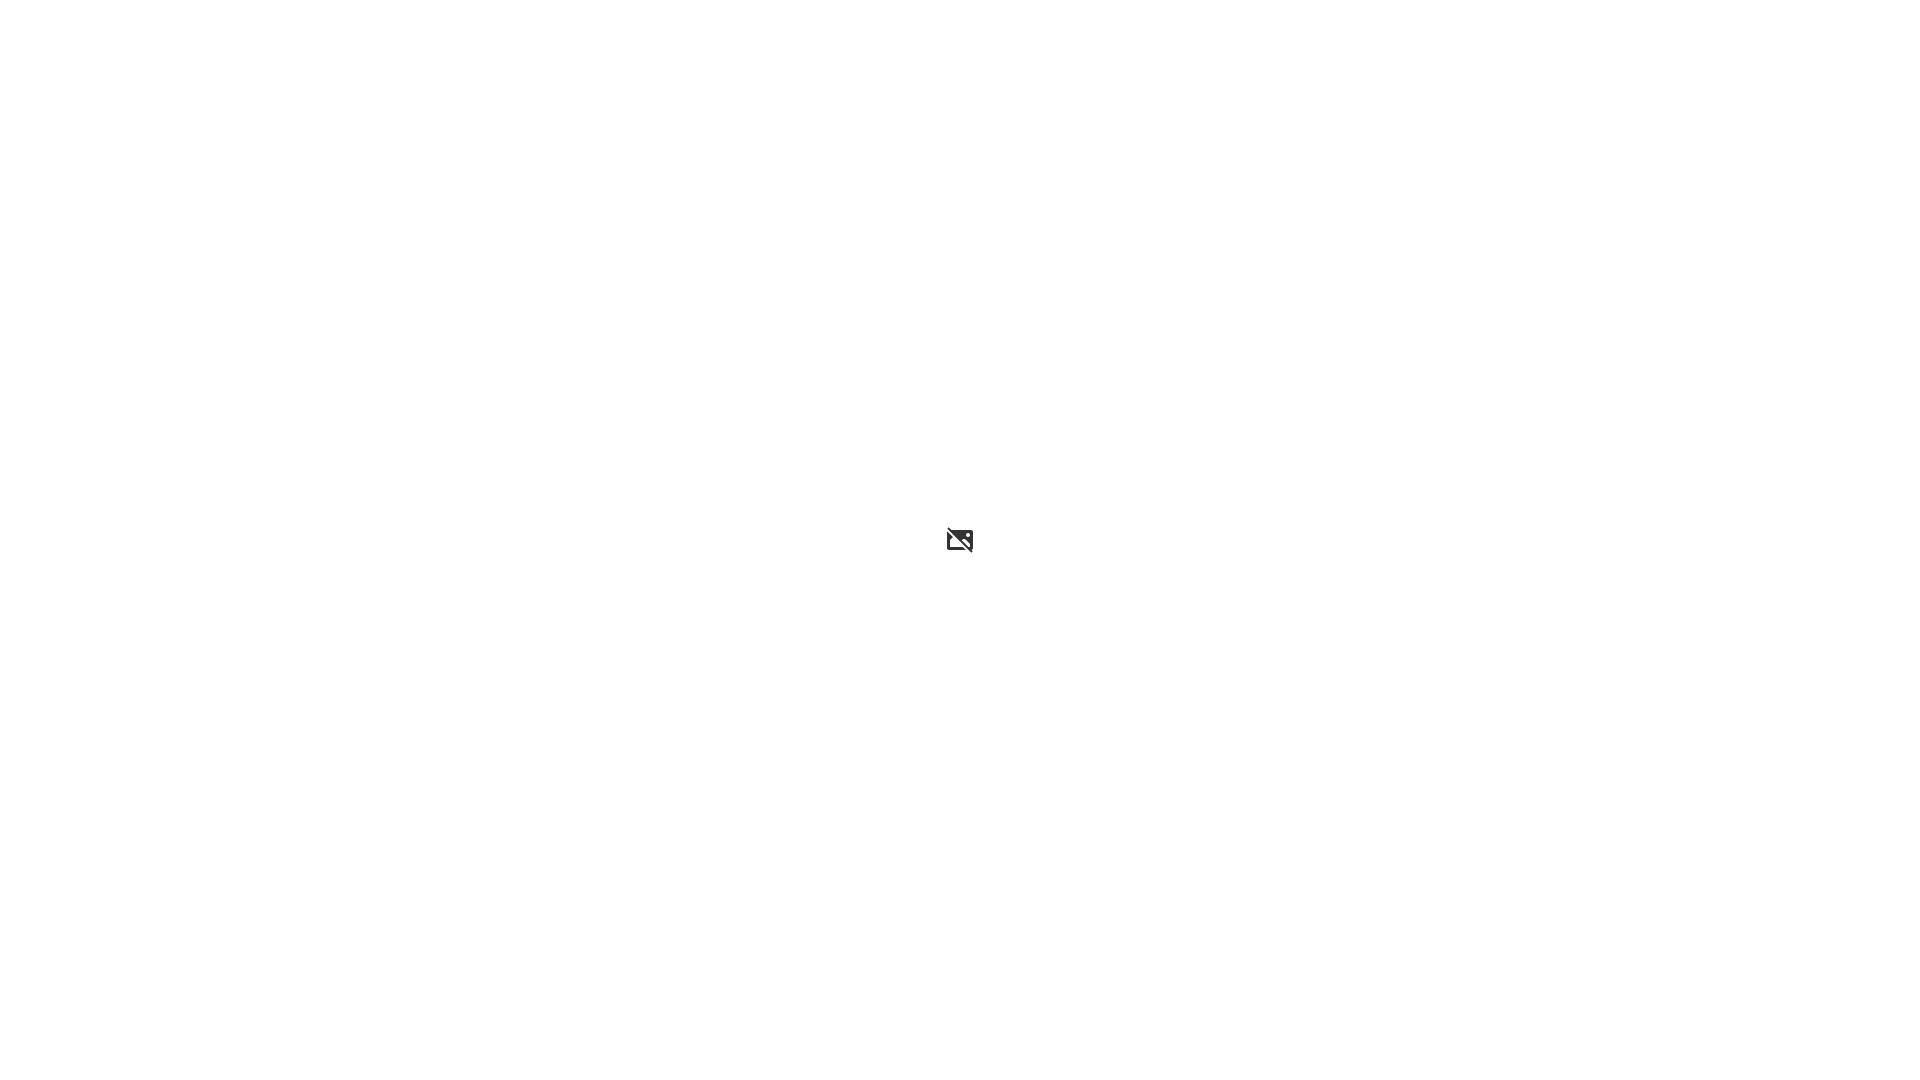 panda_annie_by_illustratedillusions-d7ufh5s